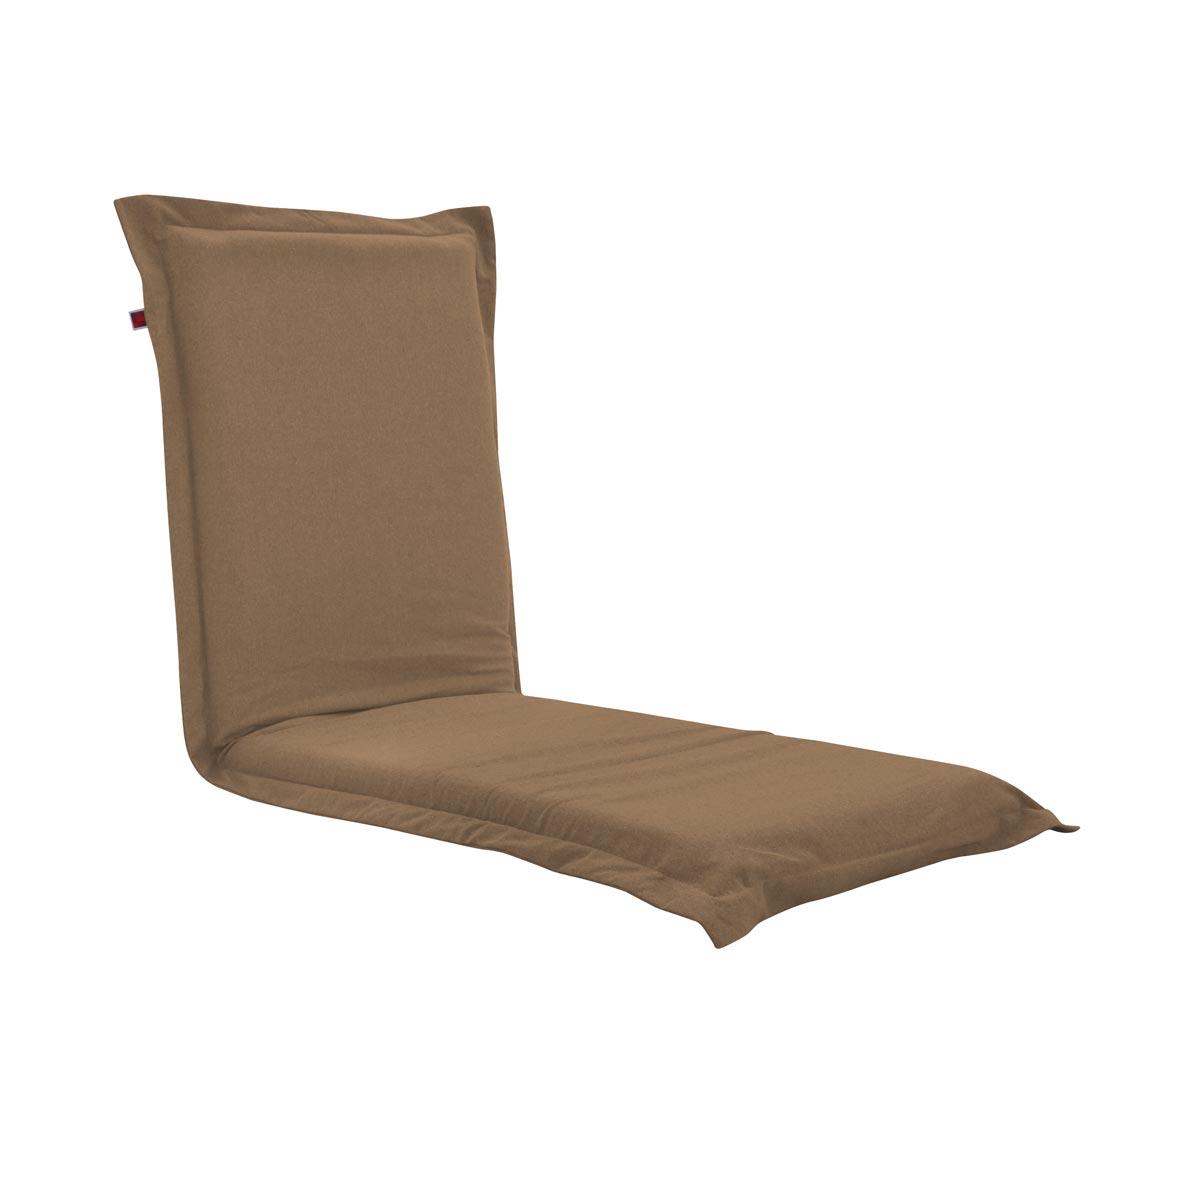 Pufe ClicClac Uno Lounge Tecido Ecolona Kraft 02 03a